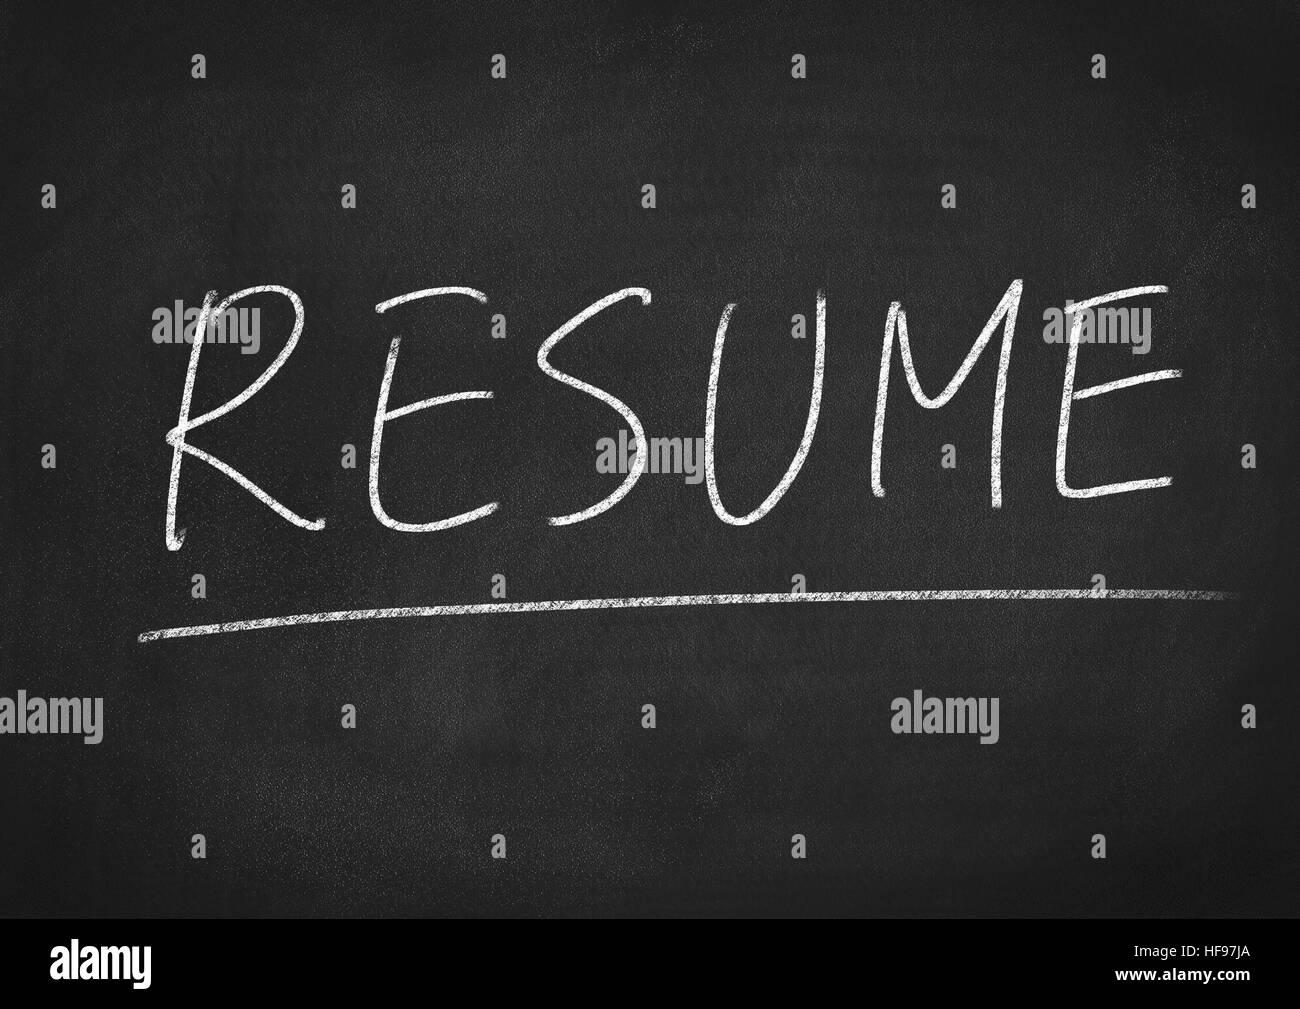 Resume Writing Imágenes De Stock & Resume Writing Fotos De Stock - Alamy